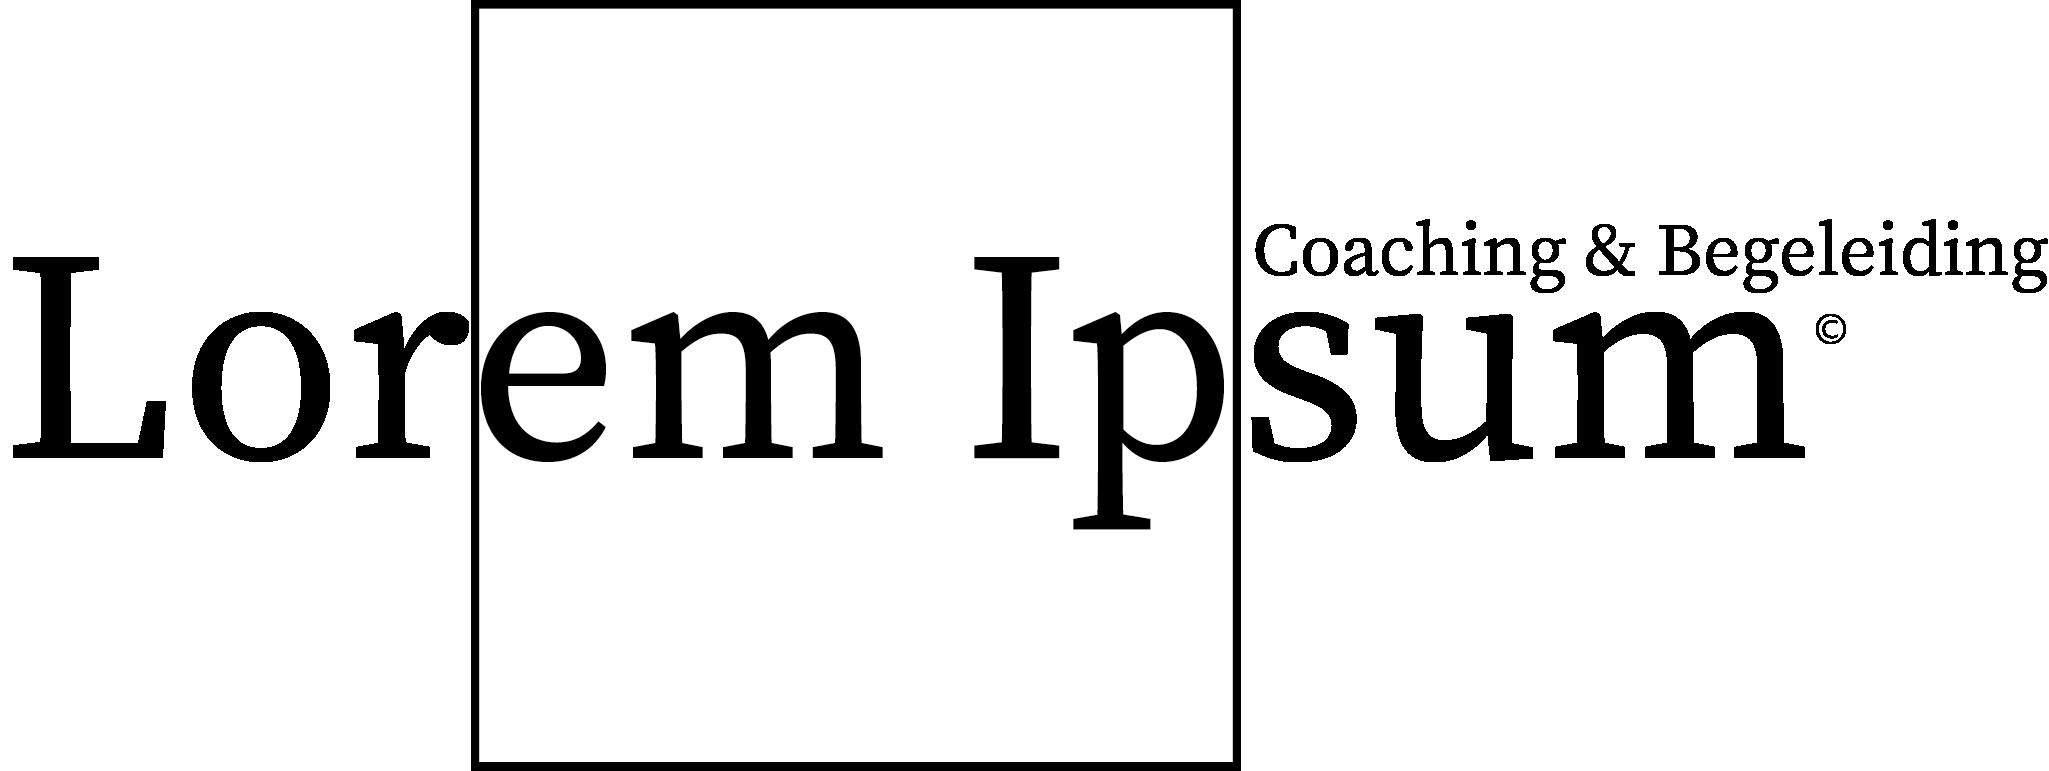 Lorem Ipsum - Coaching & Begeleiding_logo